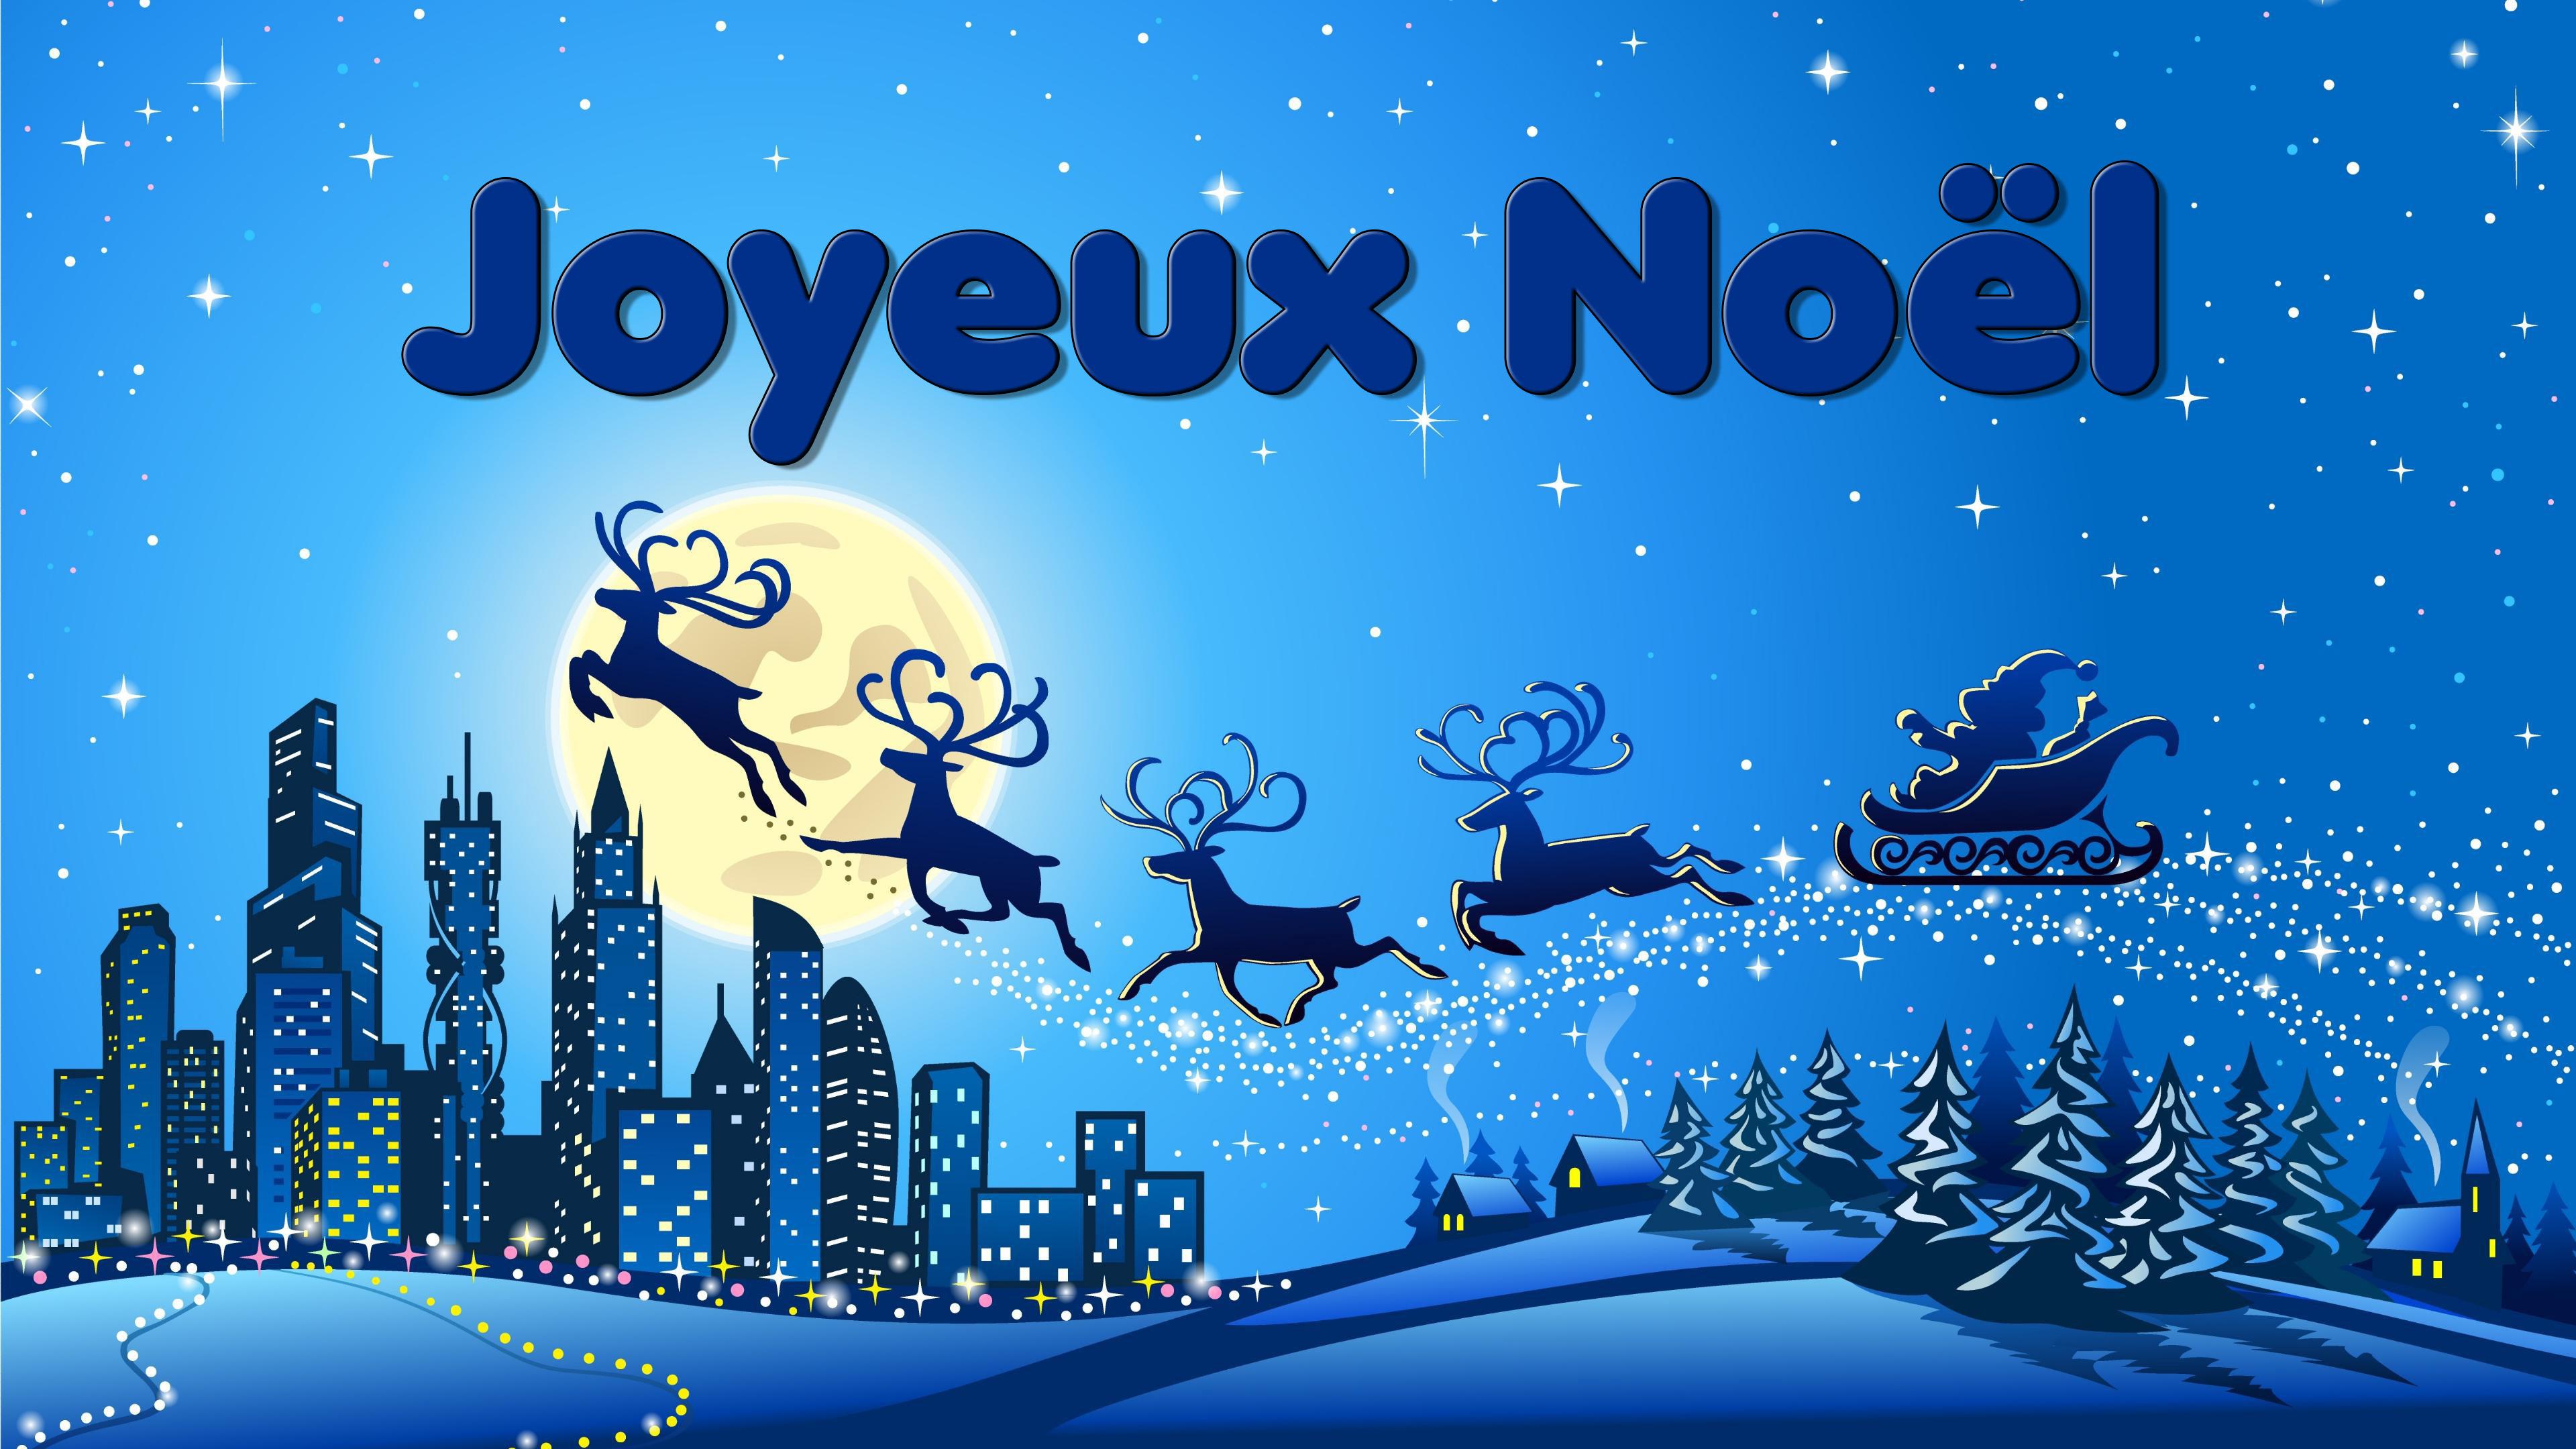 Wallpapers Joyeux Noël Maximumwall